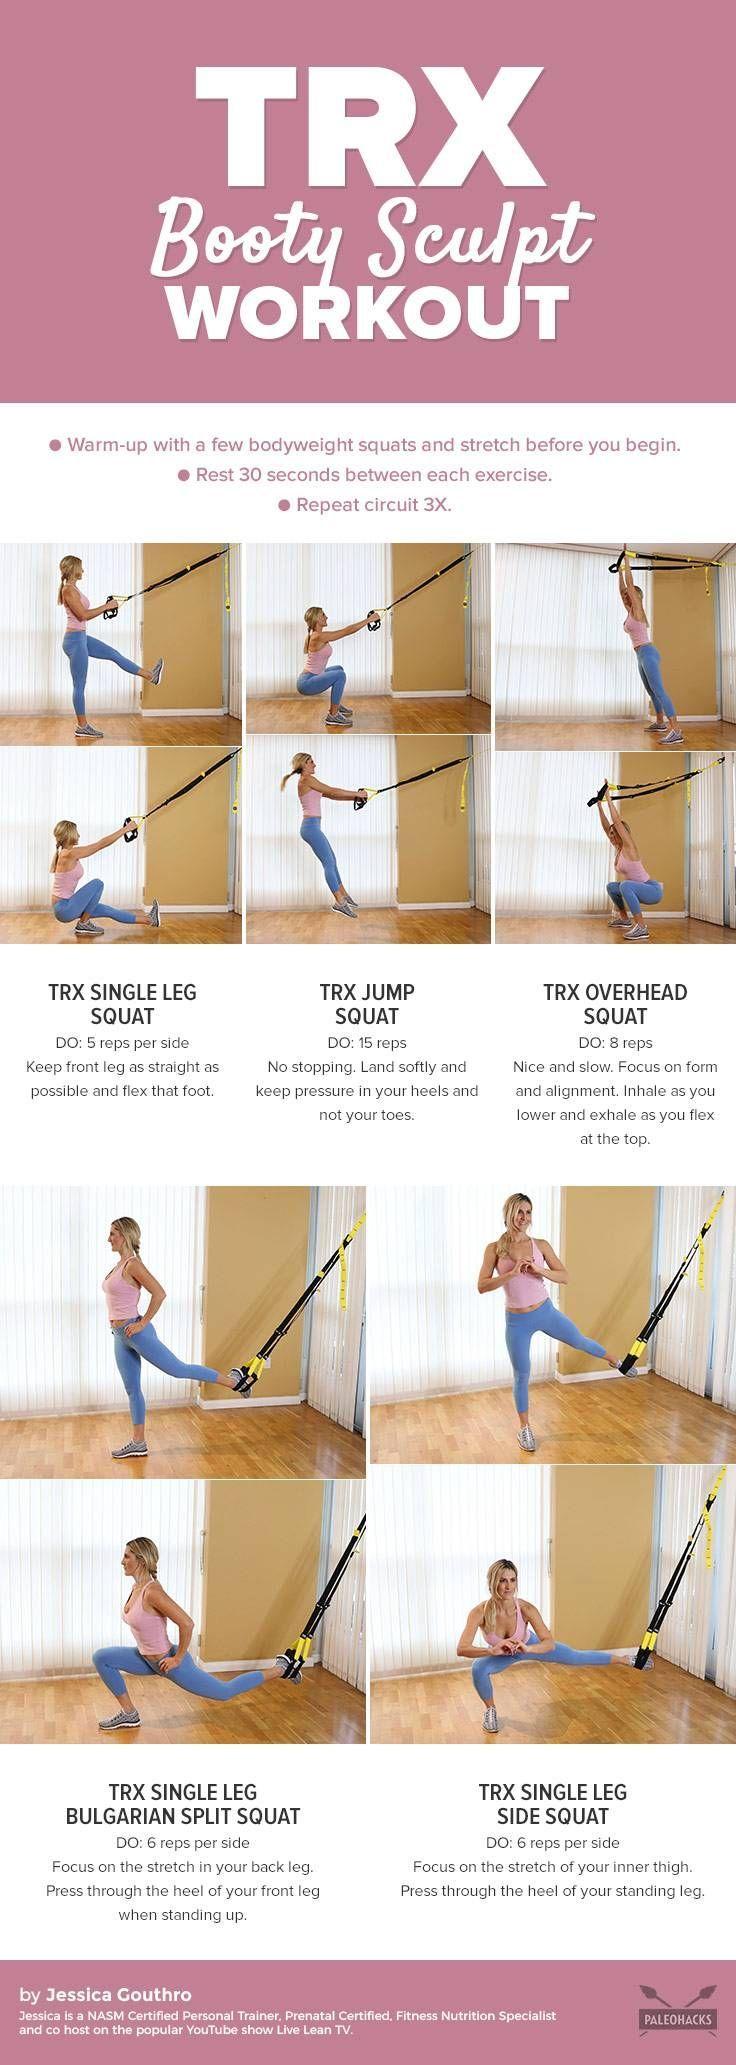 #challenging #variations #transform #effective #workout #sculpt #squats #level #booty #squat #train...